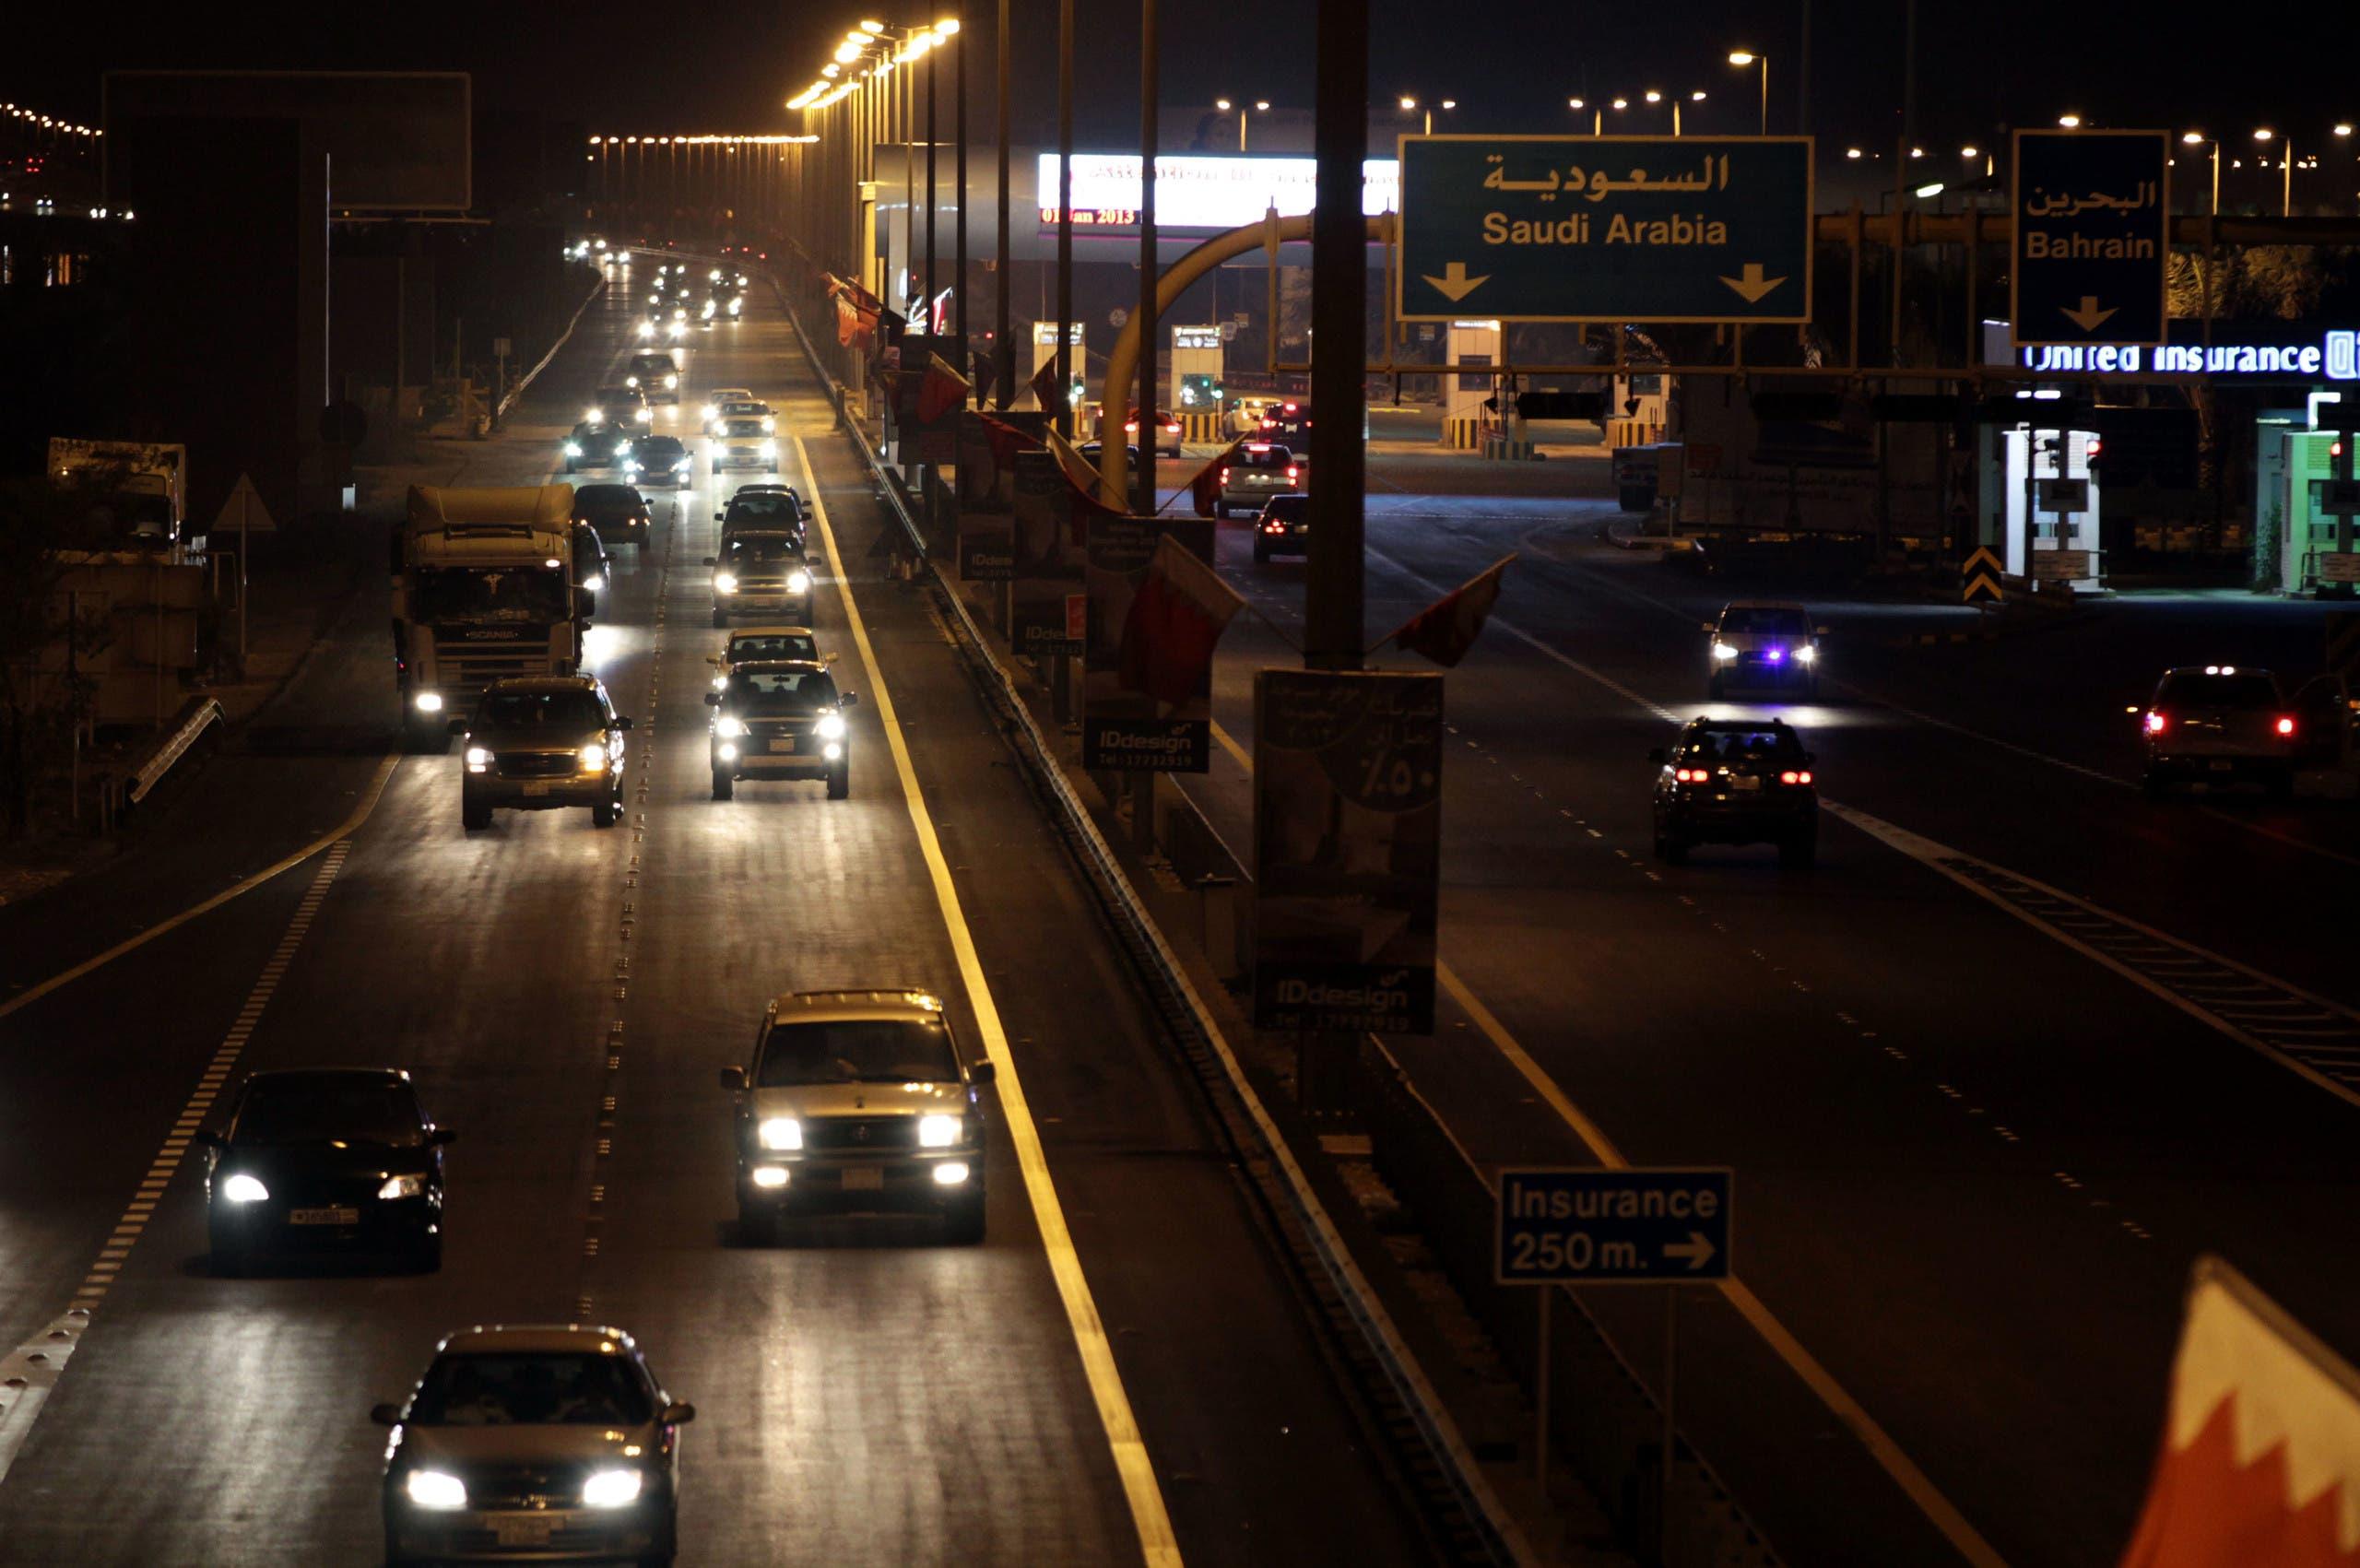 Vehicles travel into Bahrain from Saudi Arabia at King Fahd causeway Tuesday night, Jan. 1, 2013. (AP)